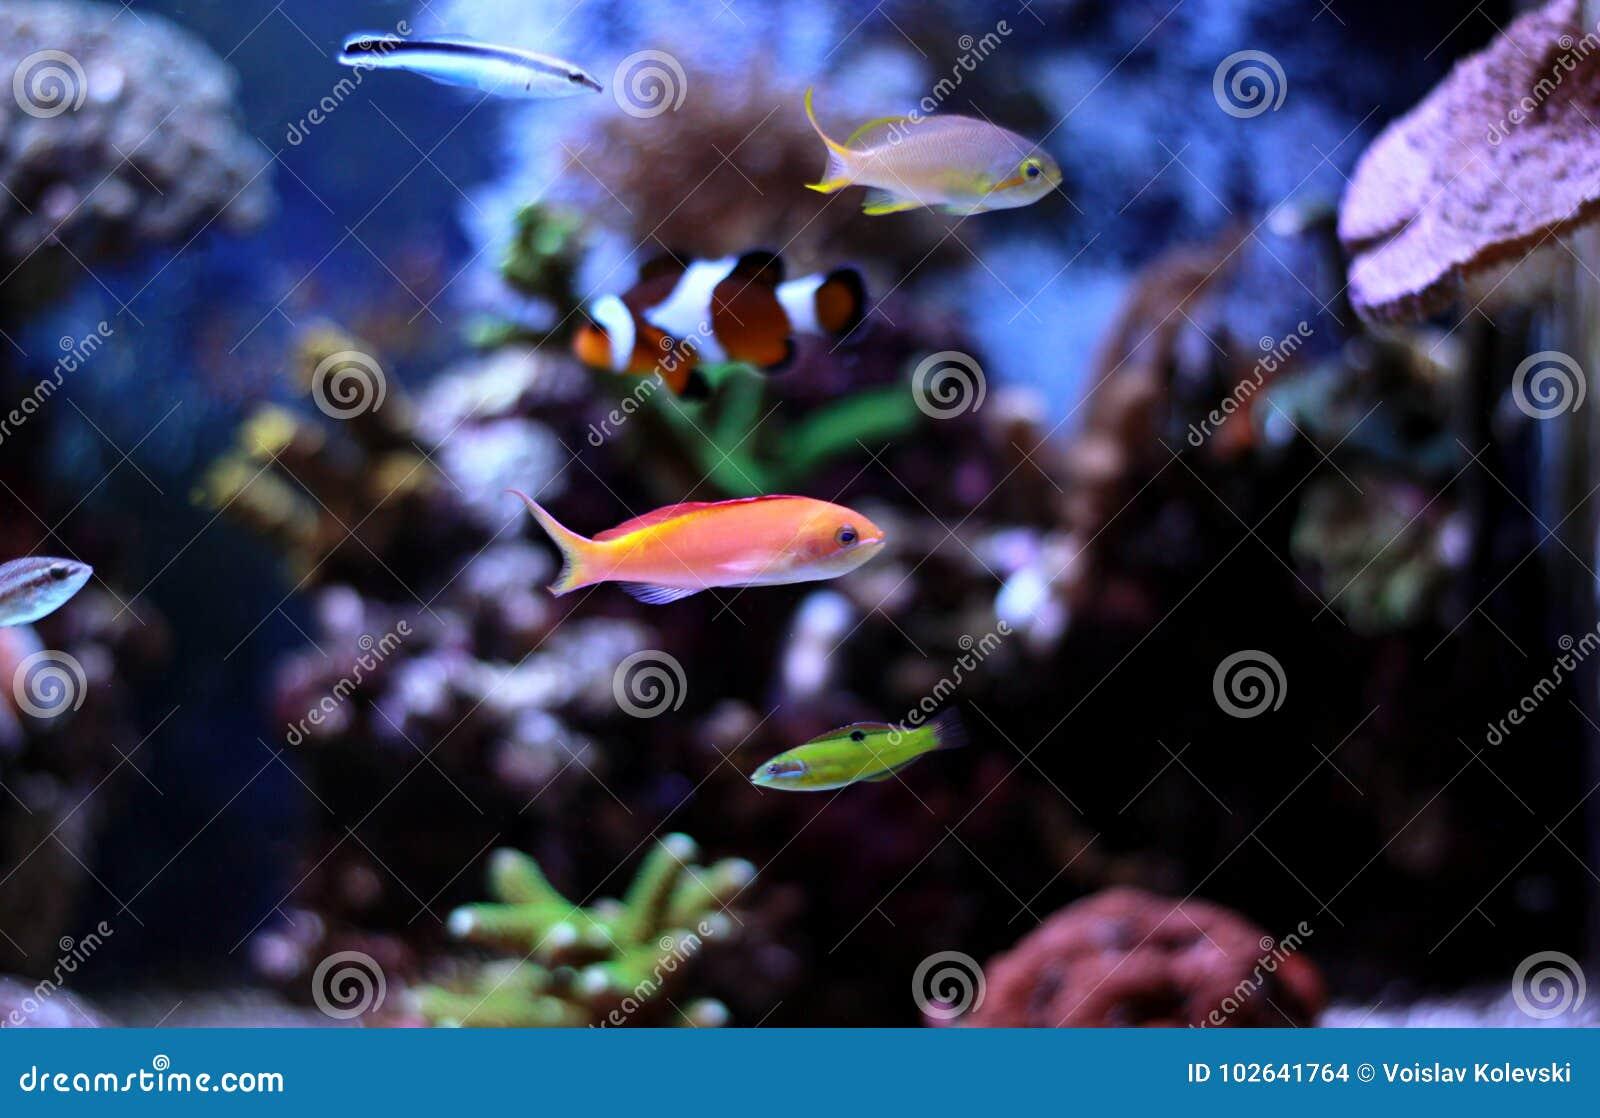 Colorful fish in reef aquarium tank